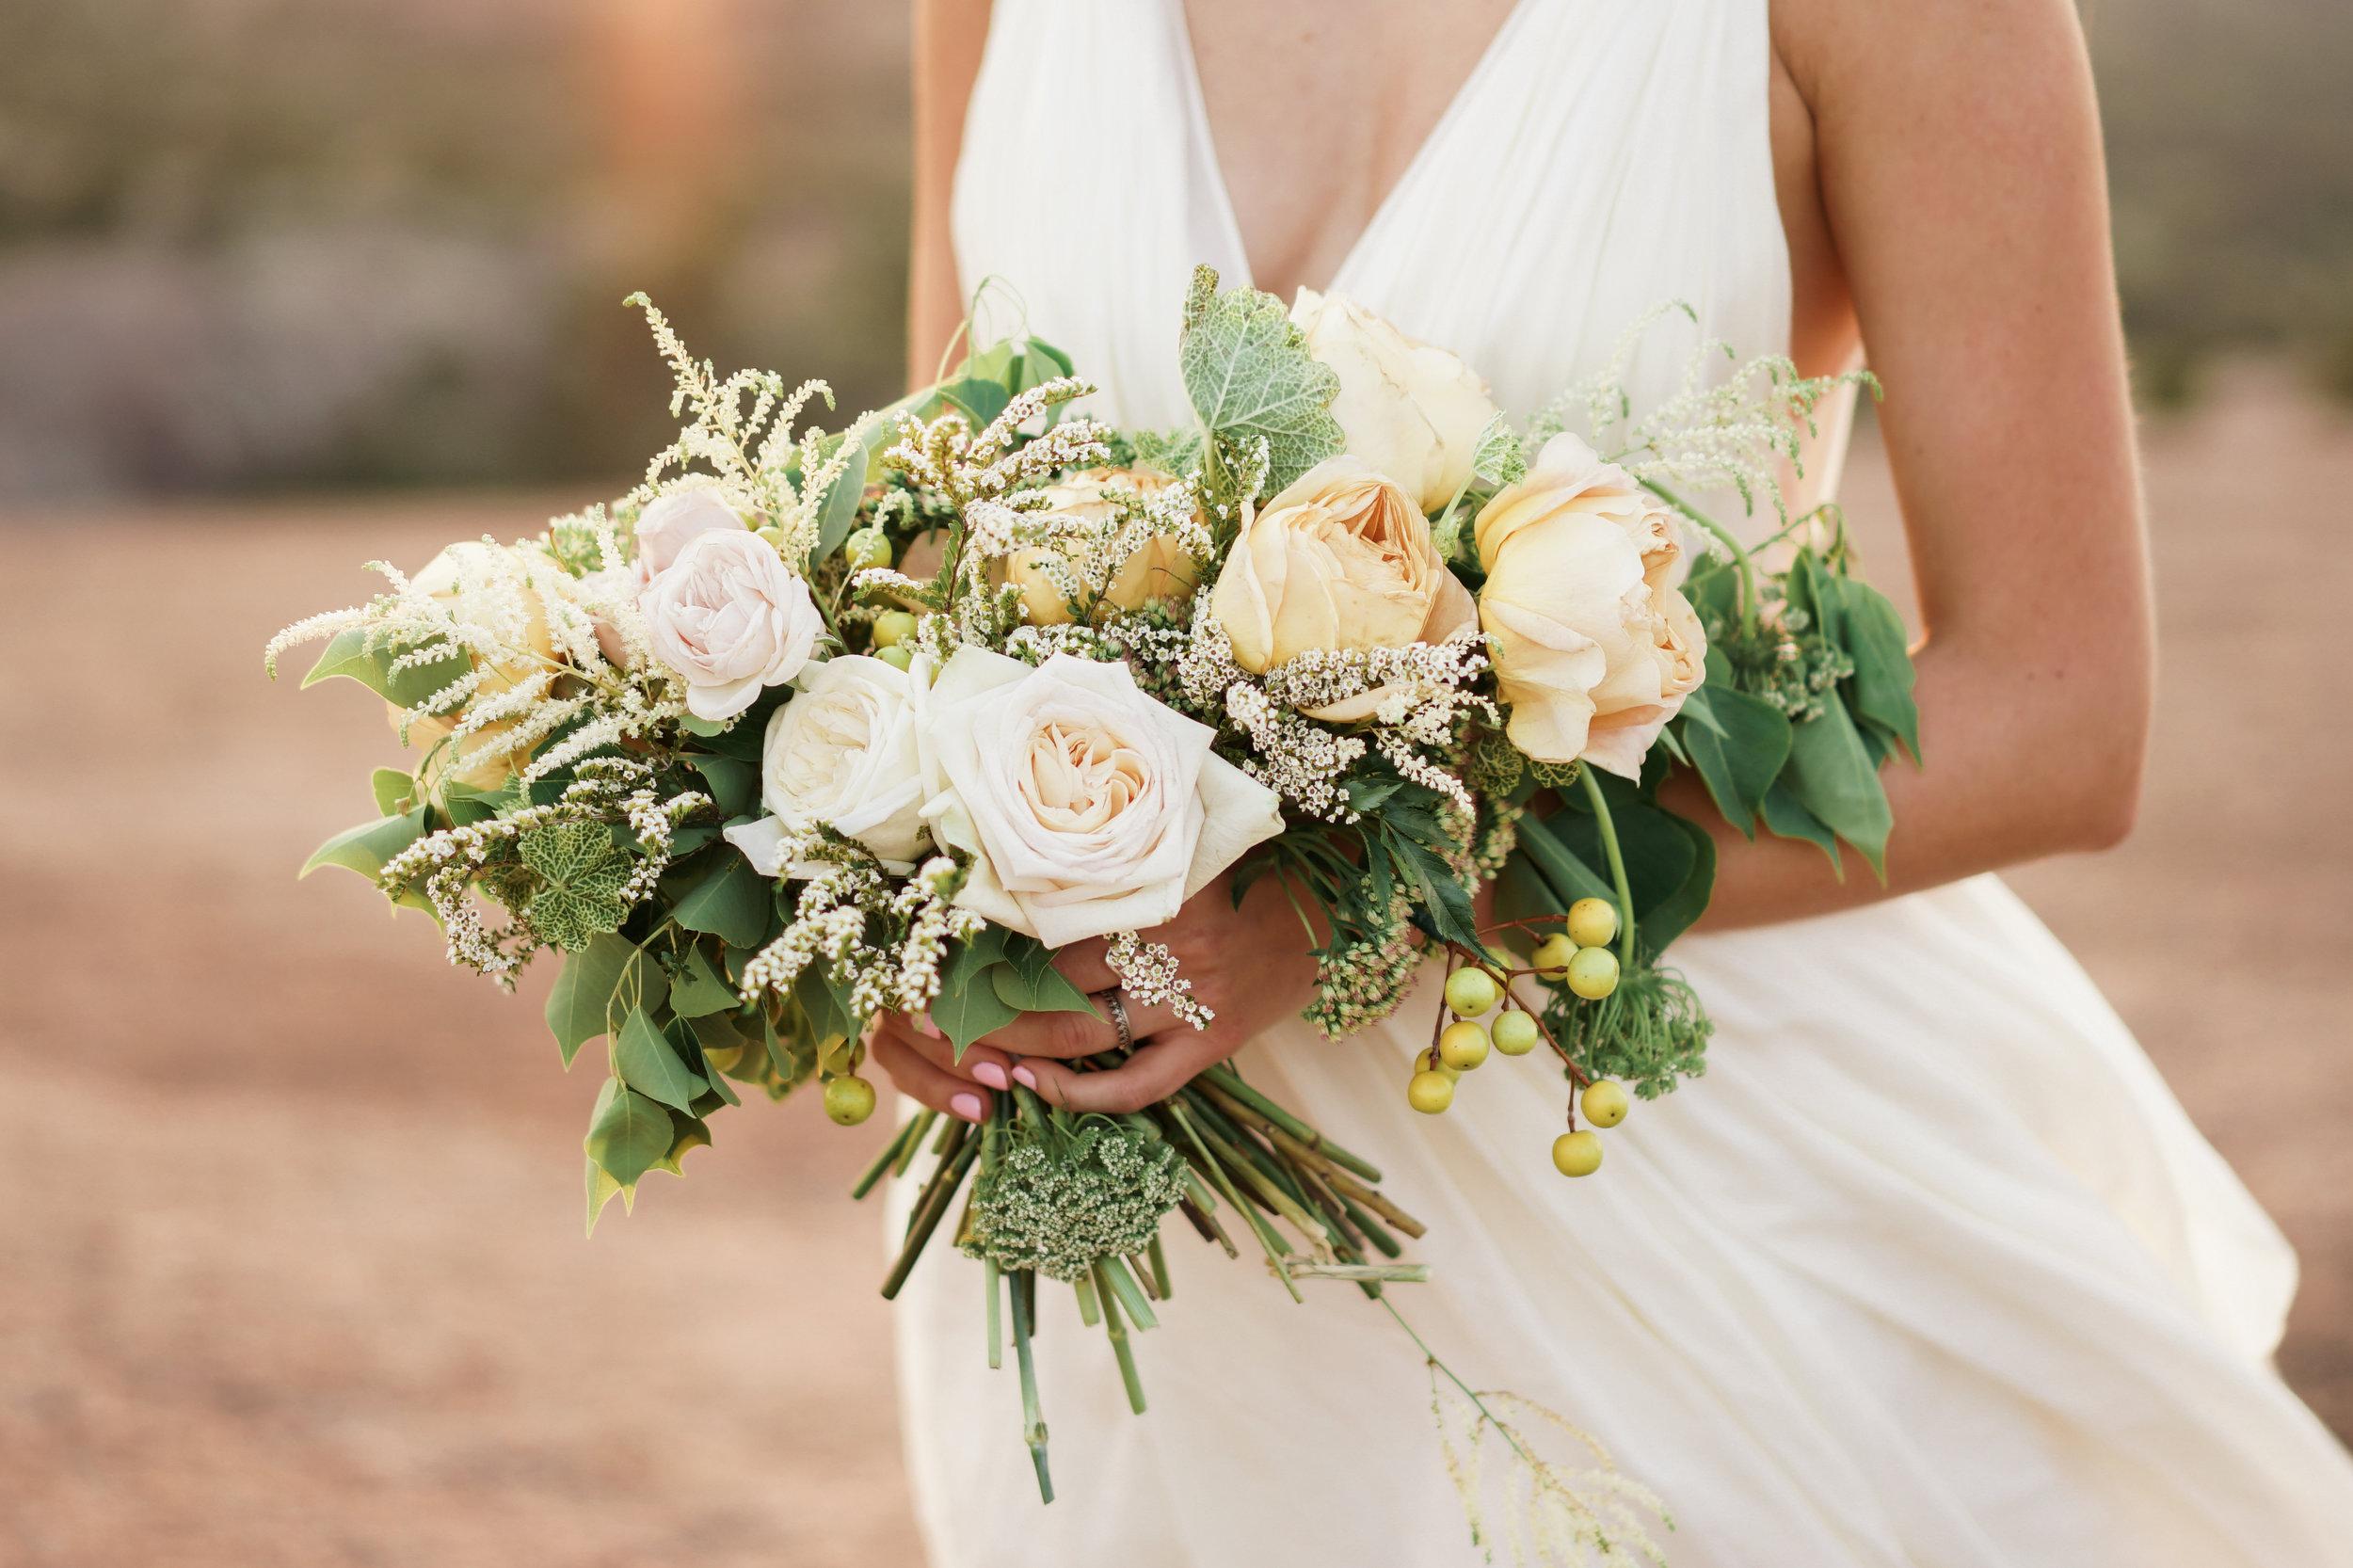 Fine Art Austin Wedding Photographer. Enchanted Rock Bridal Session. Florals by Clementine ATX.